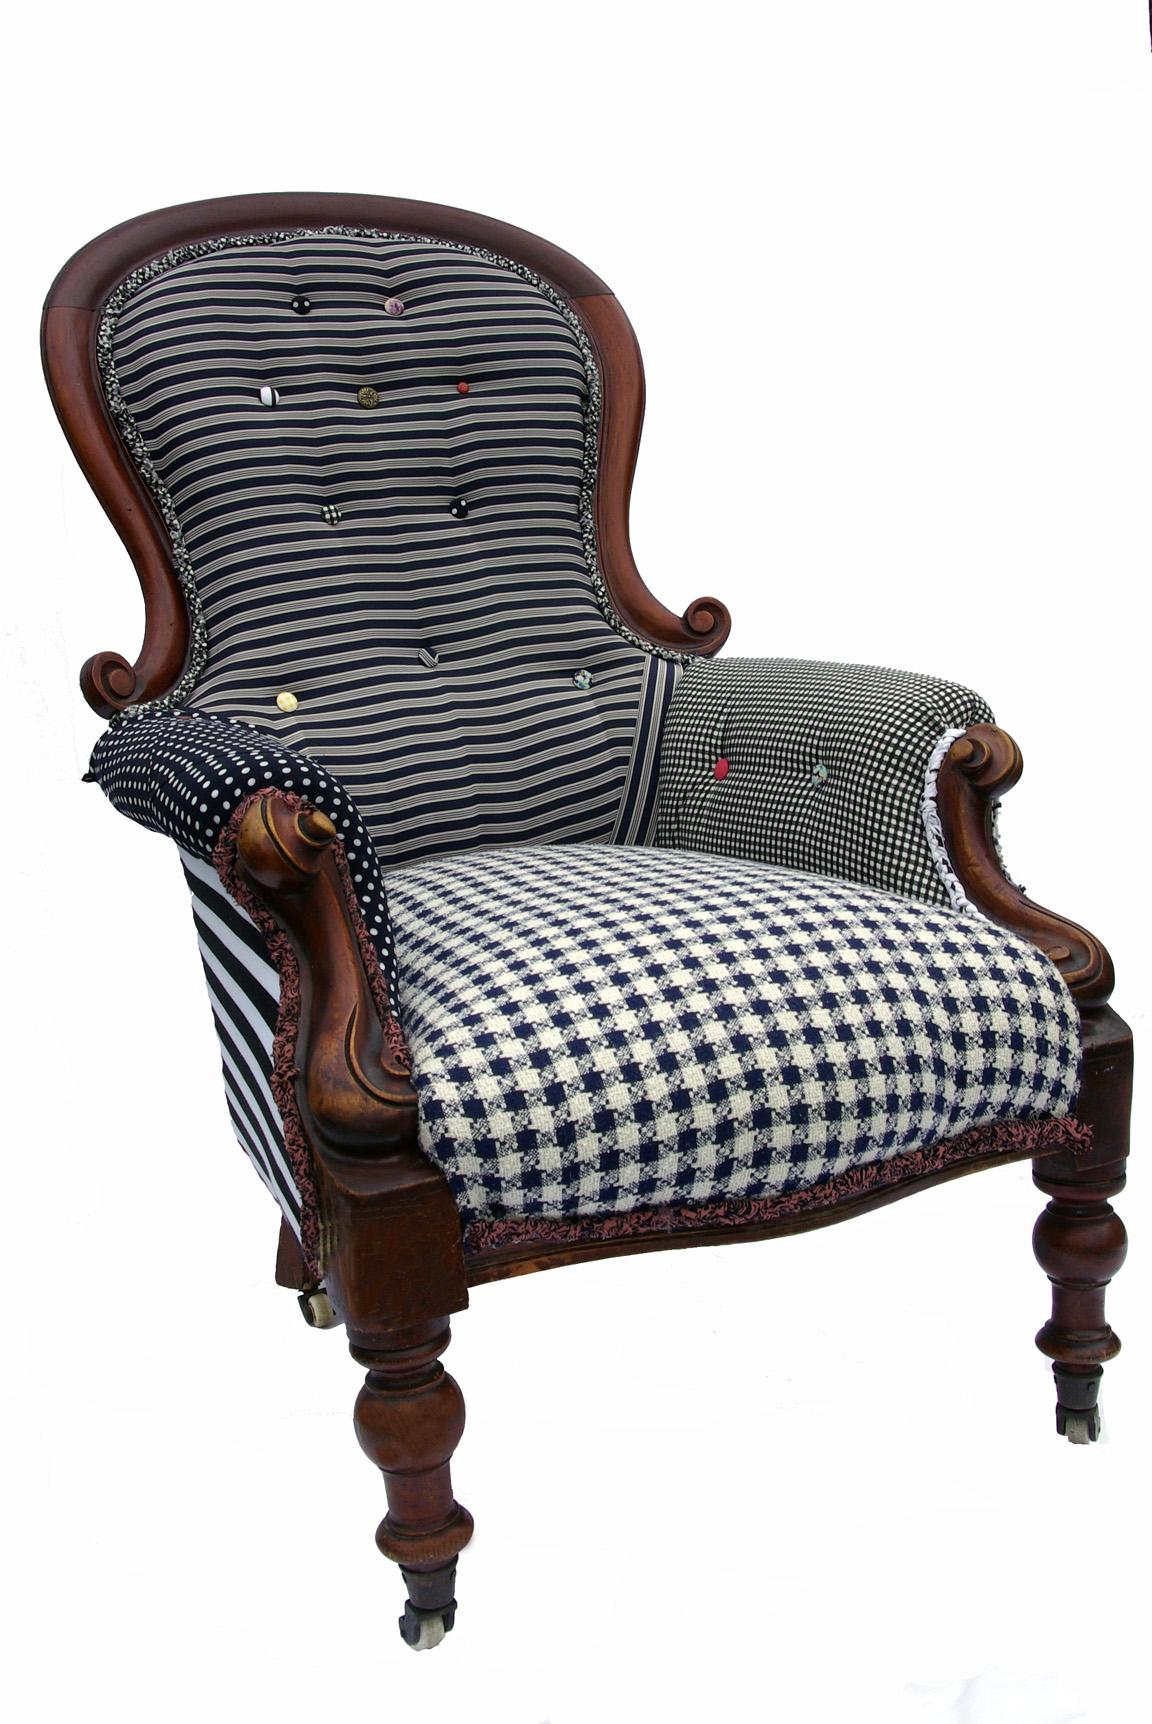 A pina pina chair_3.jpg